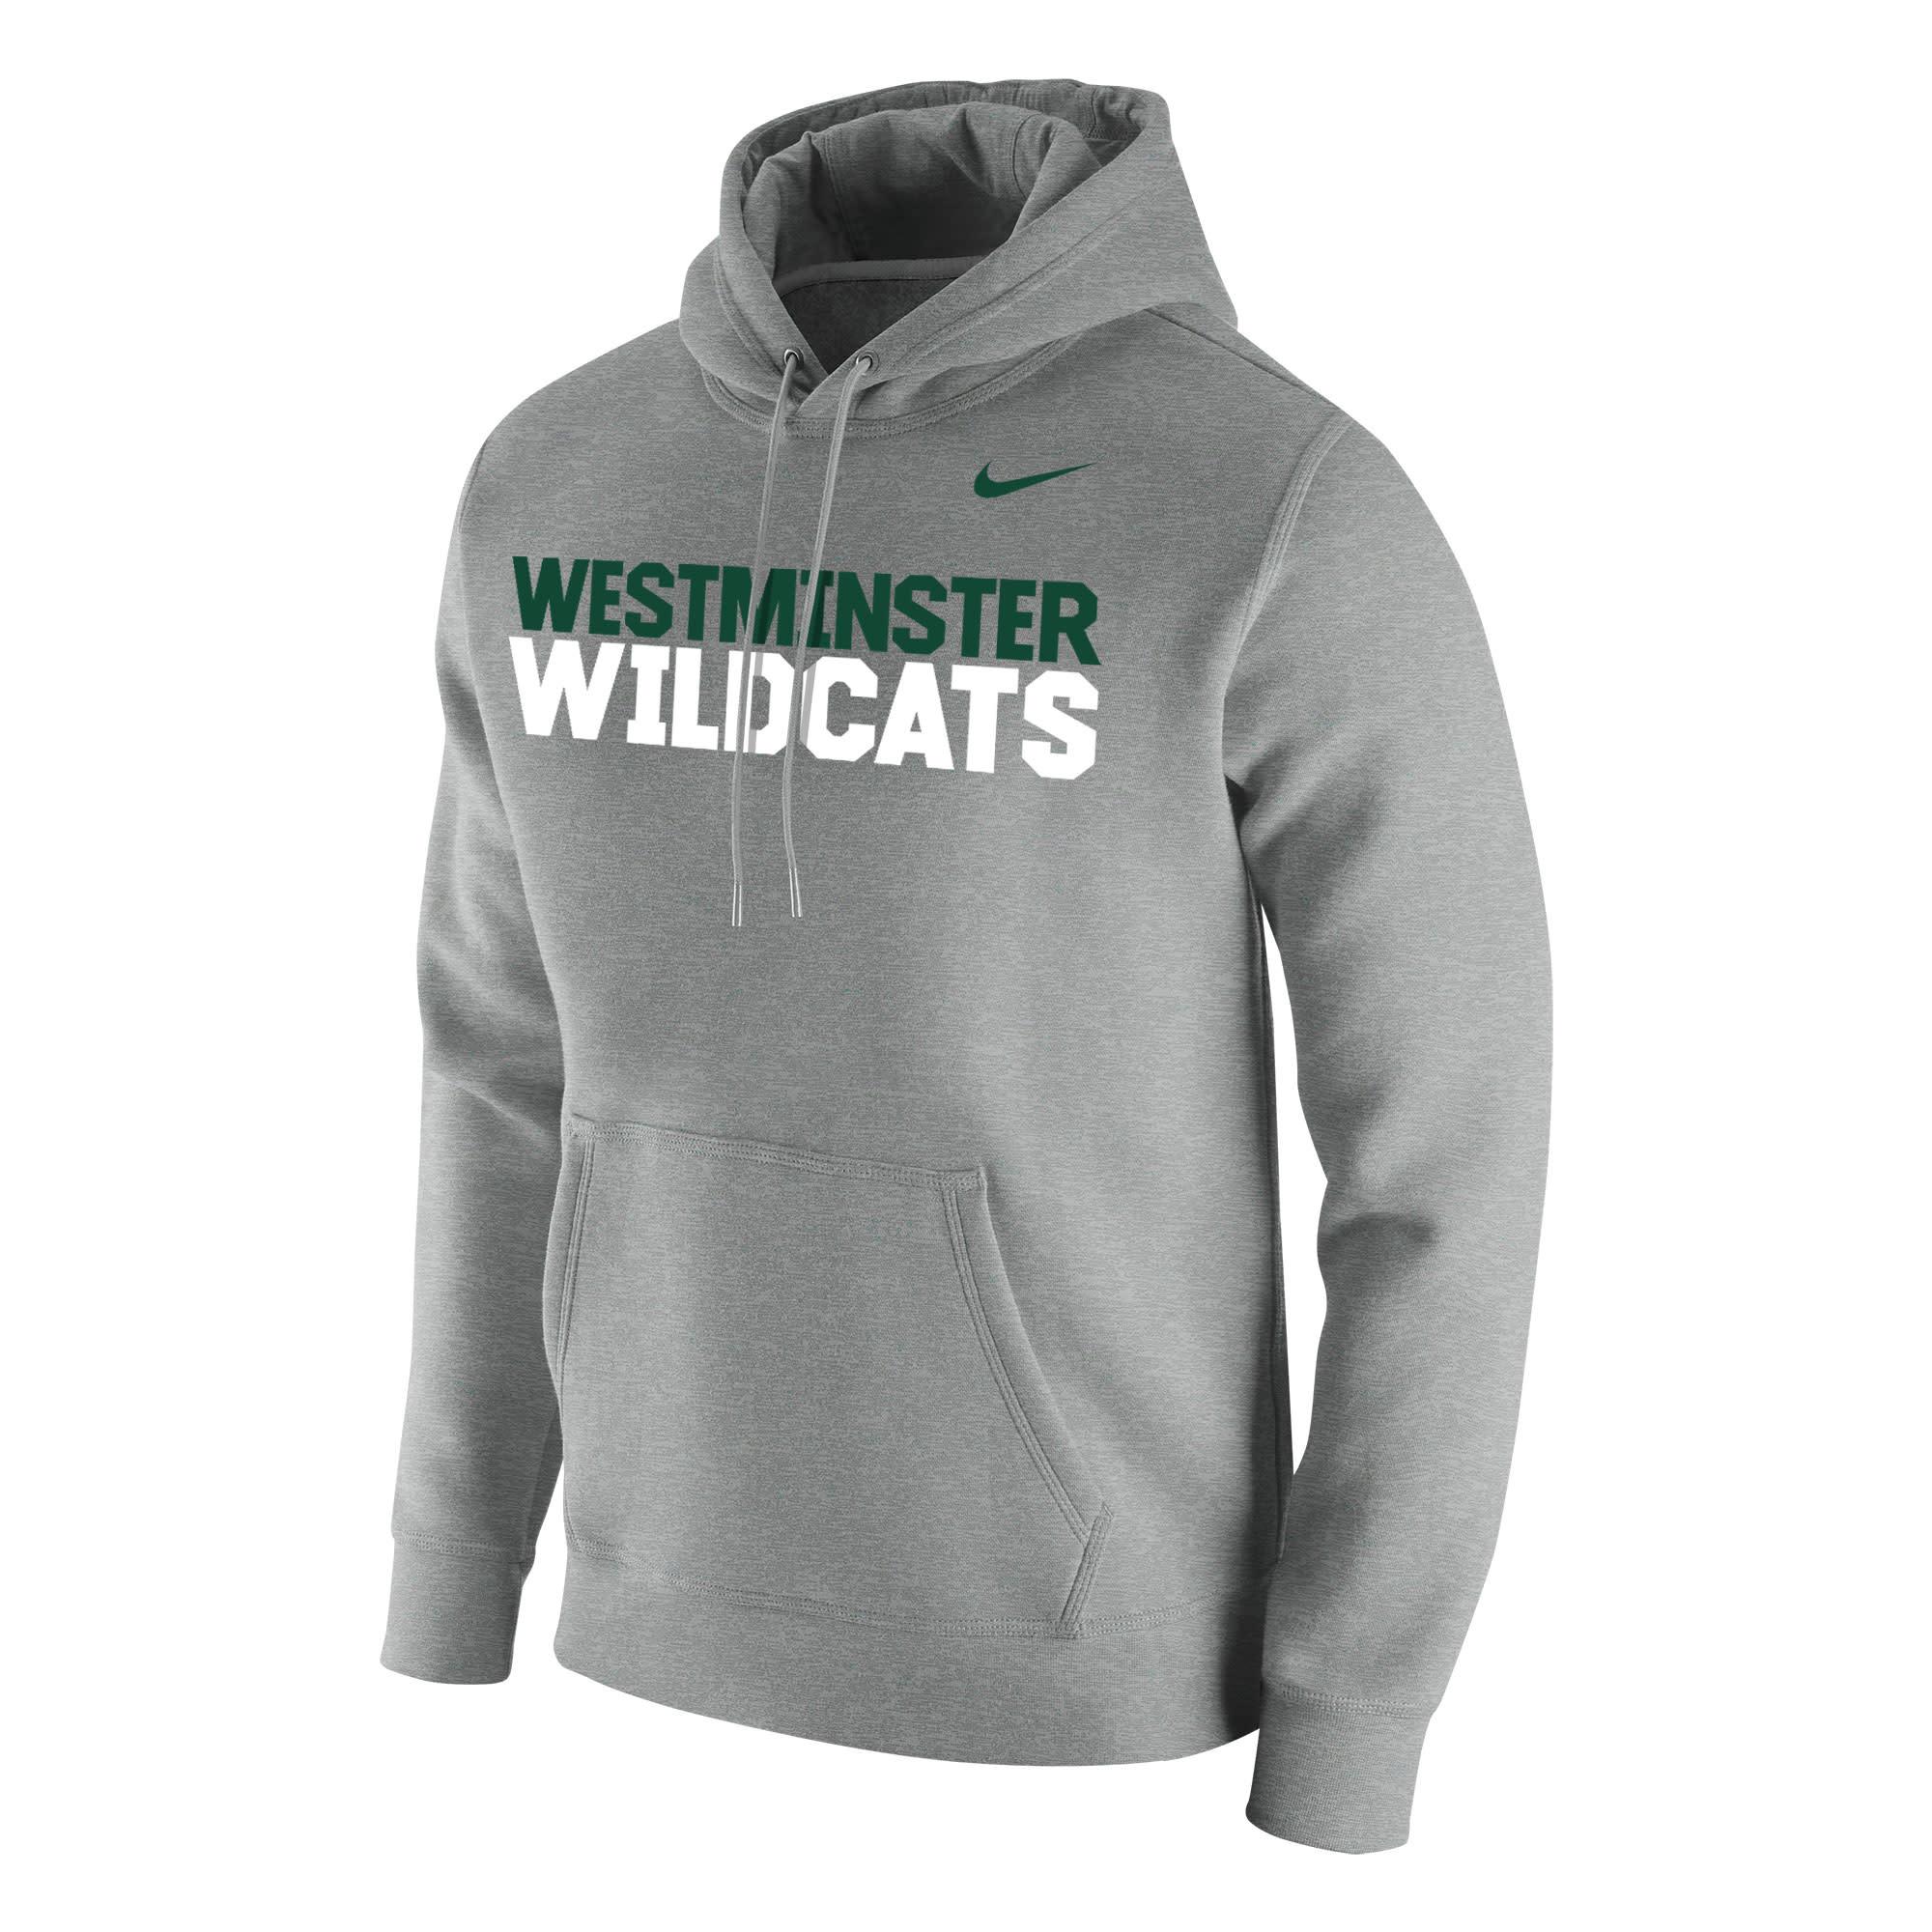 "Nike Sweatshirt: Nike Club Fleece PO Hoody w/Dual Color ""Westminster Wildcats"""